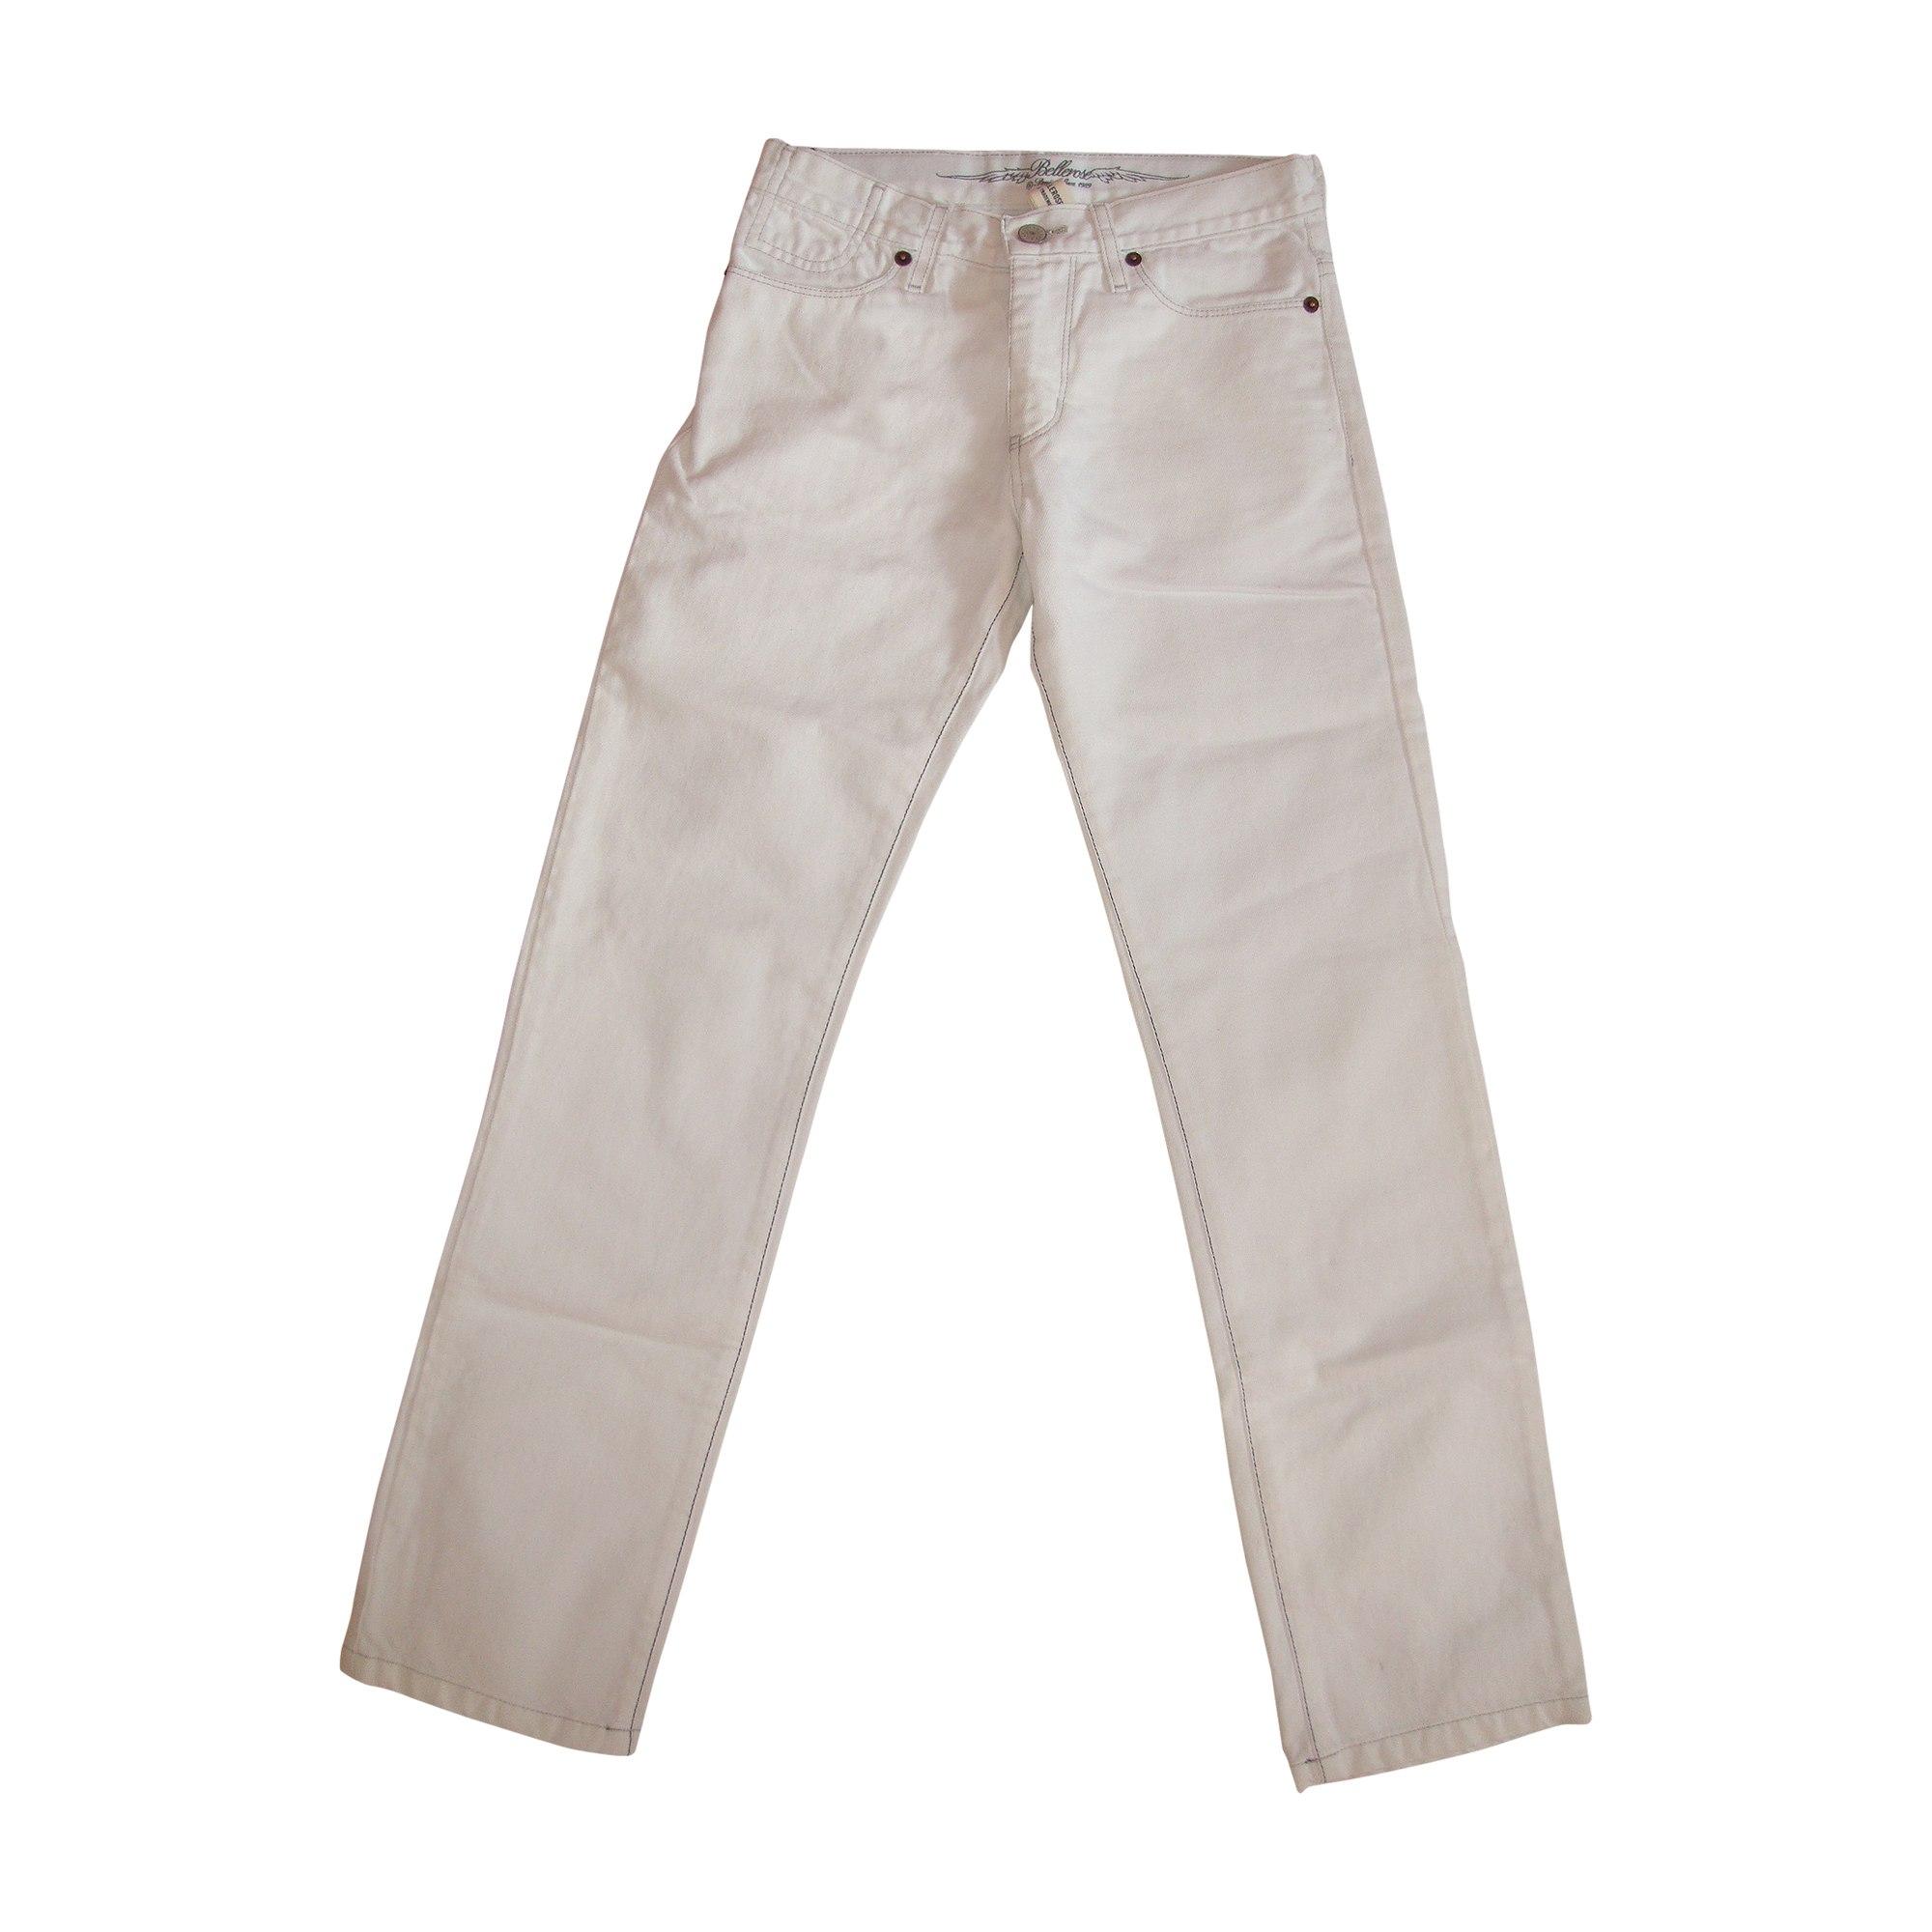 Skinny Jeans BELLEROSE White, off-white, ecru